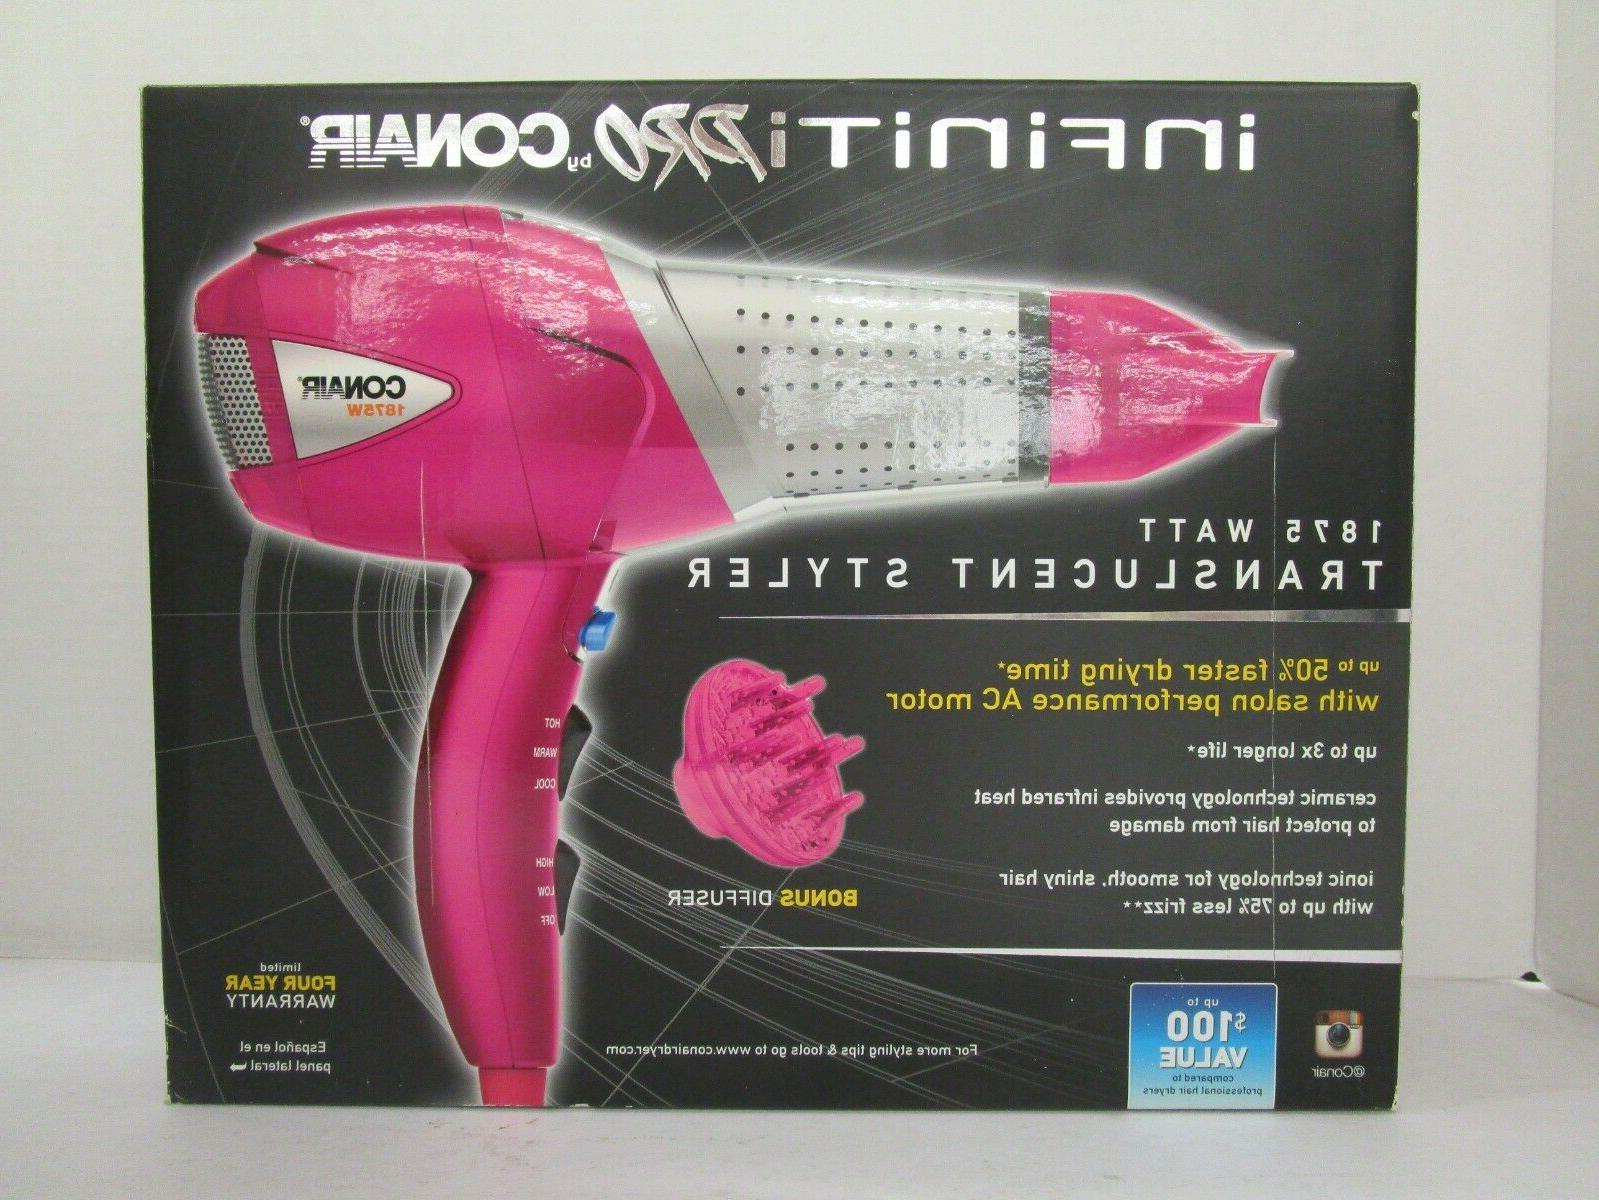 Infiniti Pro by Conair 1875 Watt Translucent Styler/Hair Dry